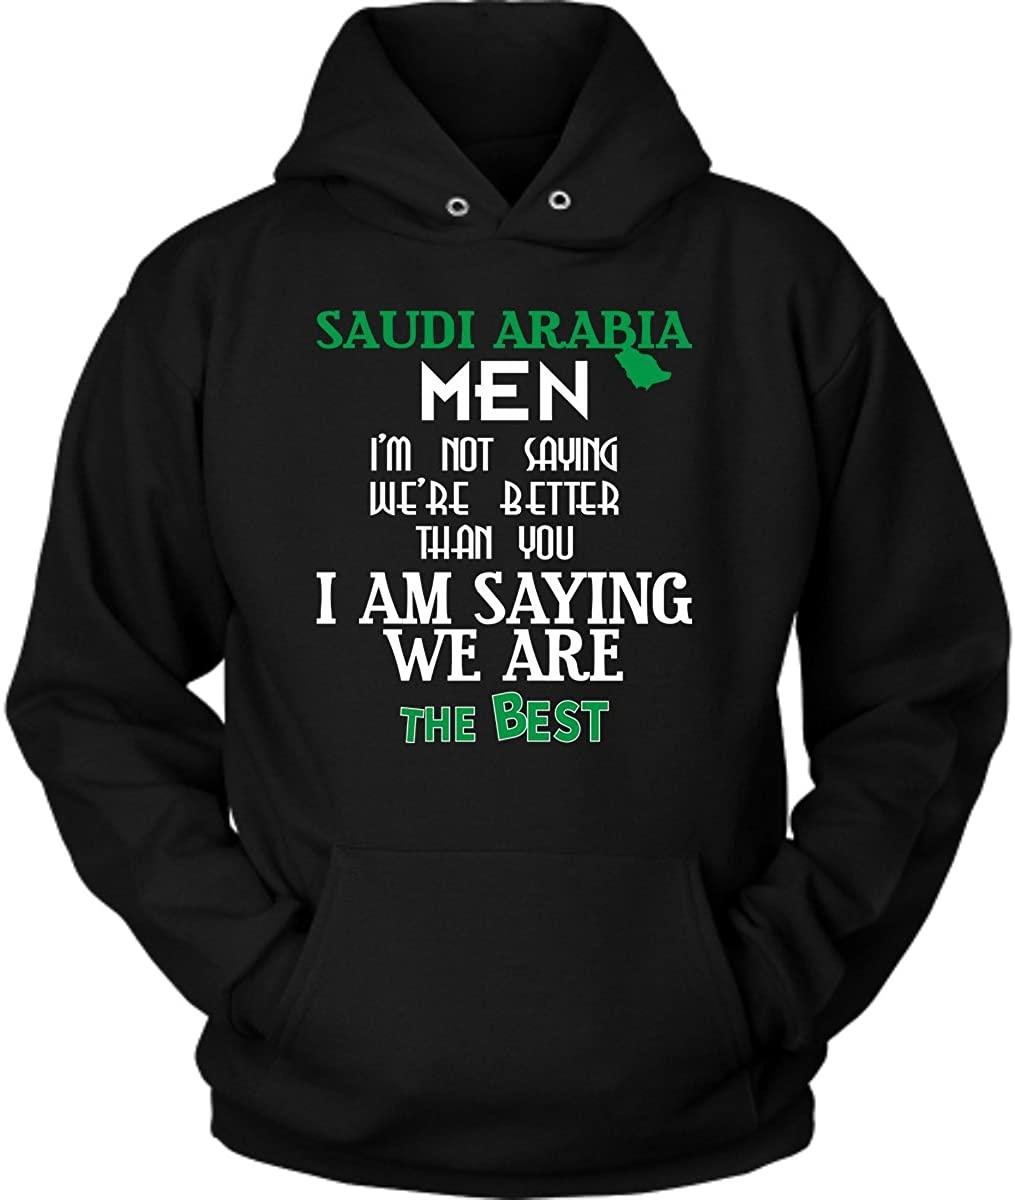 District Hoodies Saudi Arabia Hoodie. Cute and Funny Gift Idea.